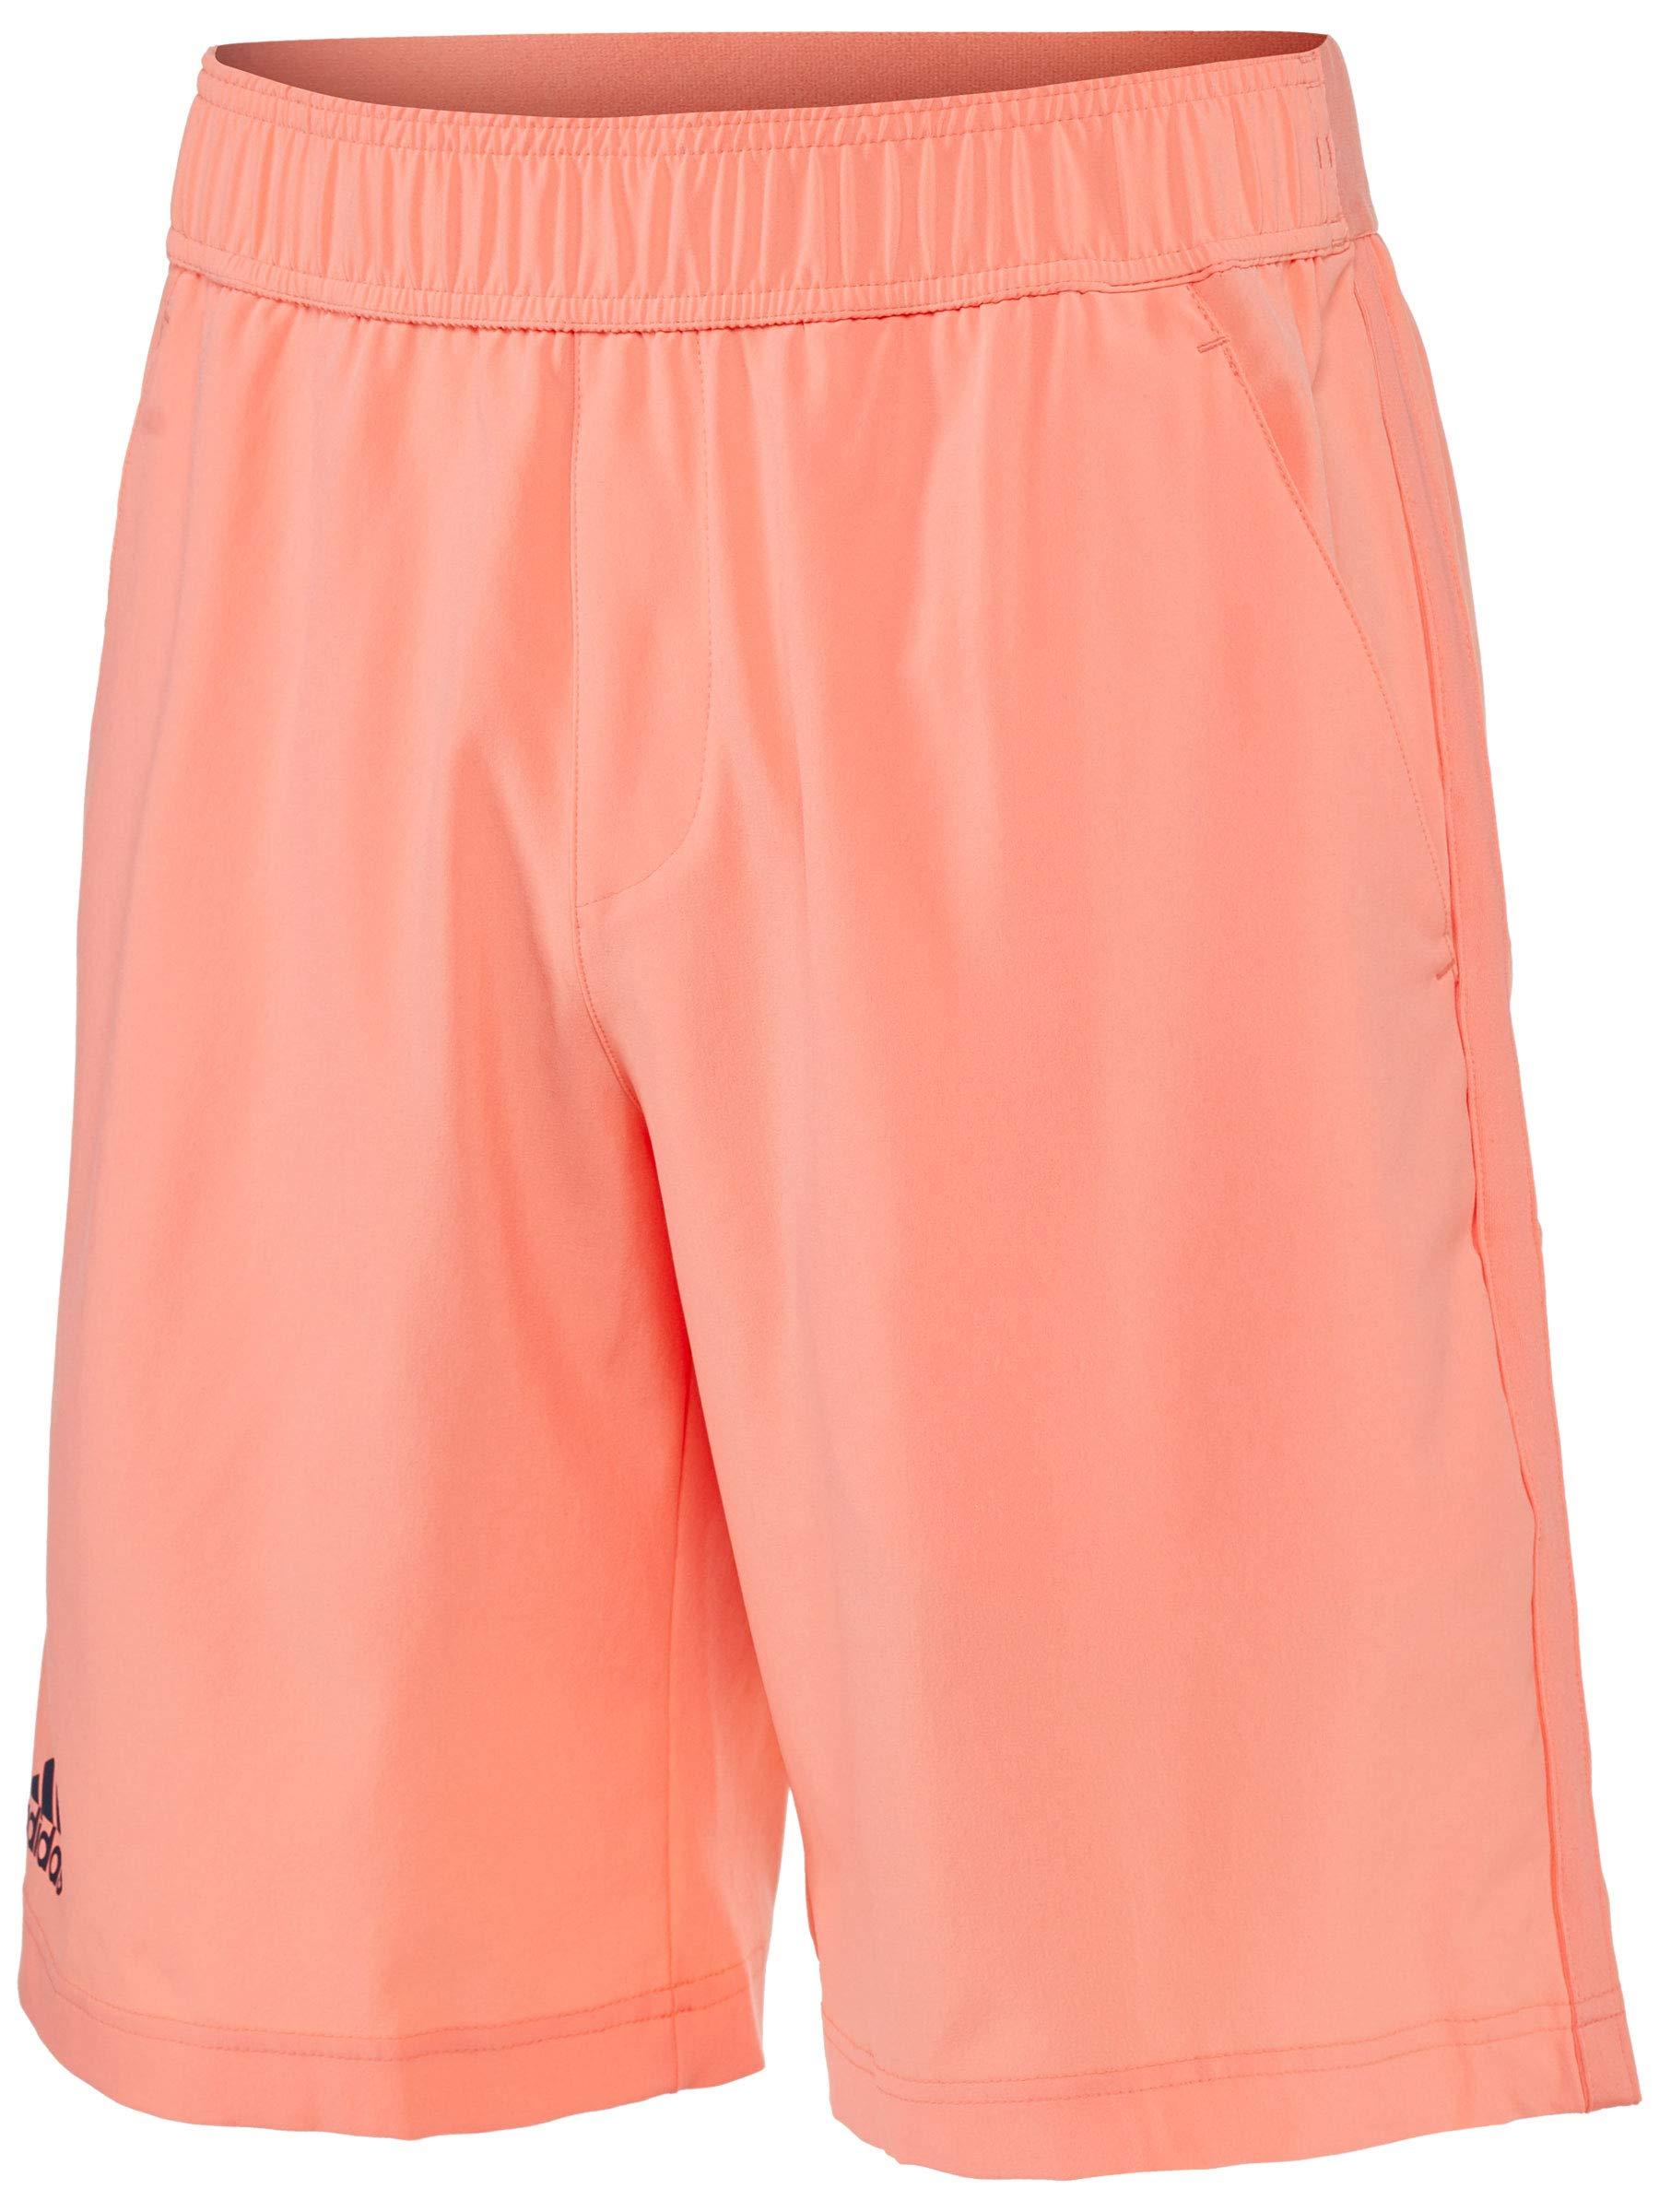 adidas Men's Essex Shorts Chalk Coral Medium 9.5